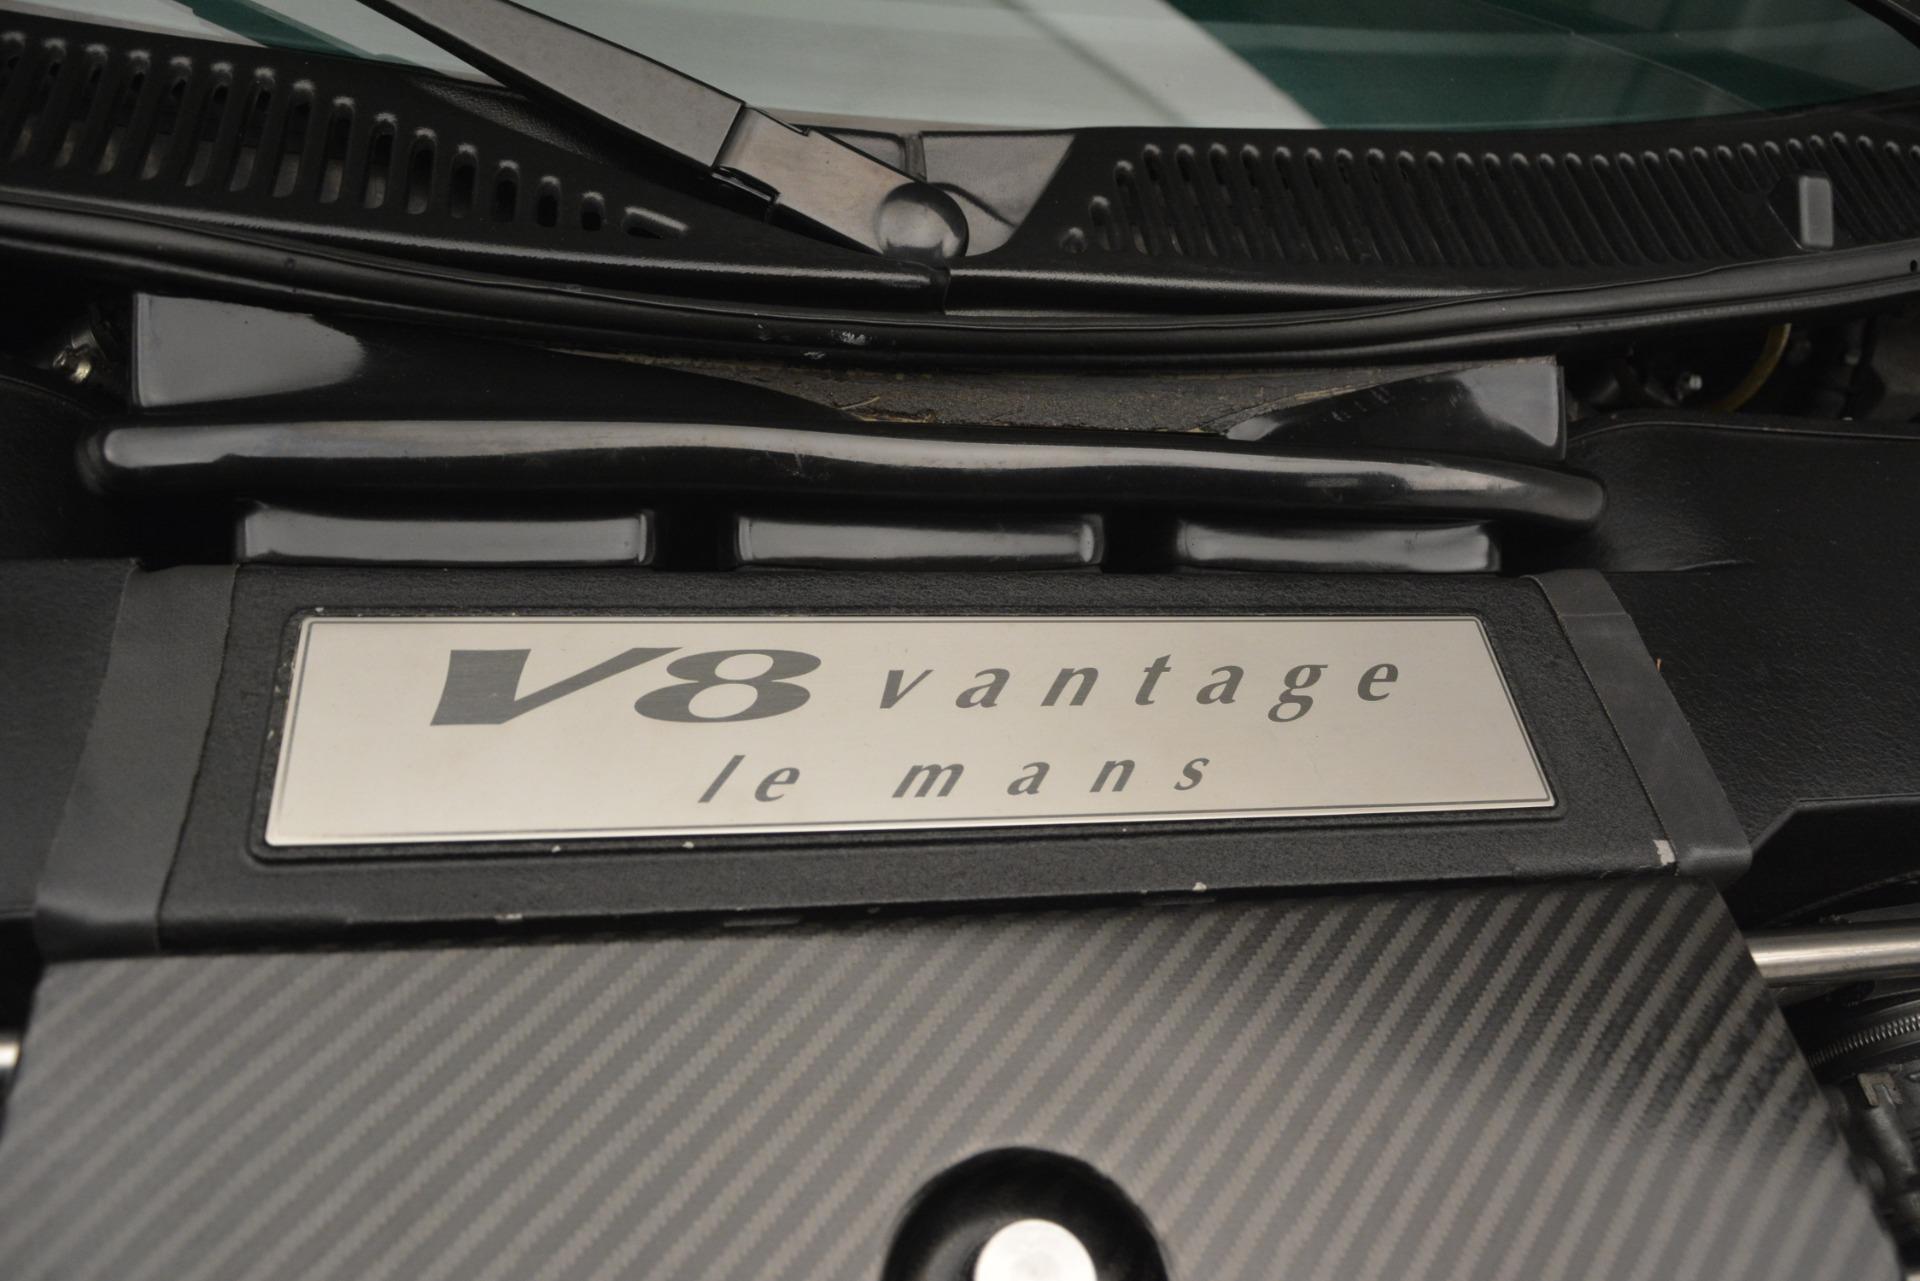 Used 1999 Aston Martin V8 Vantage Le Mans V600 Coupe For Sale In Westport, CT 2789_p33